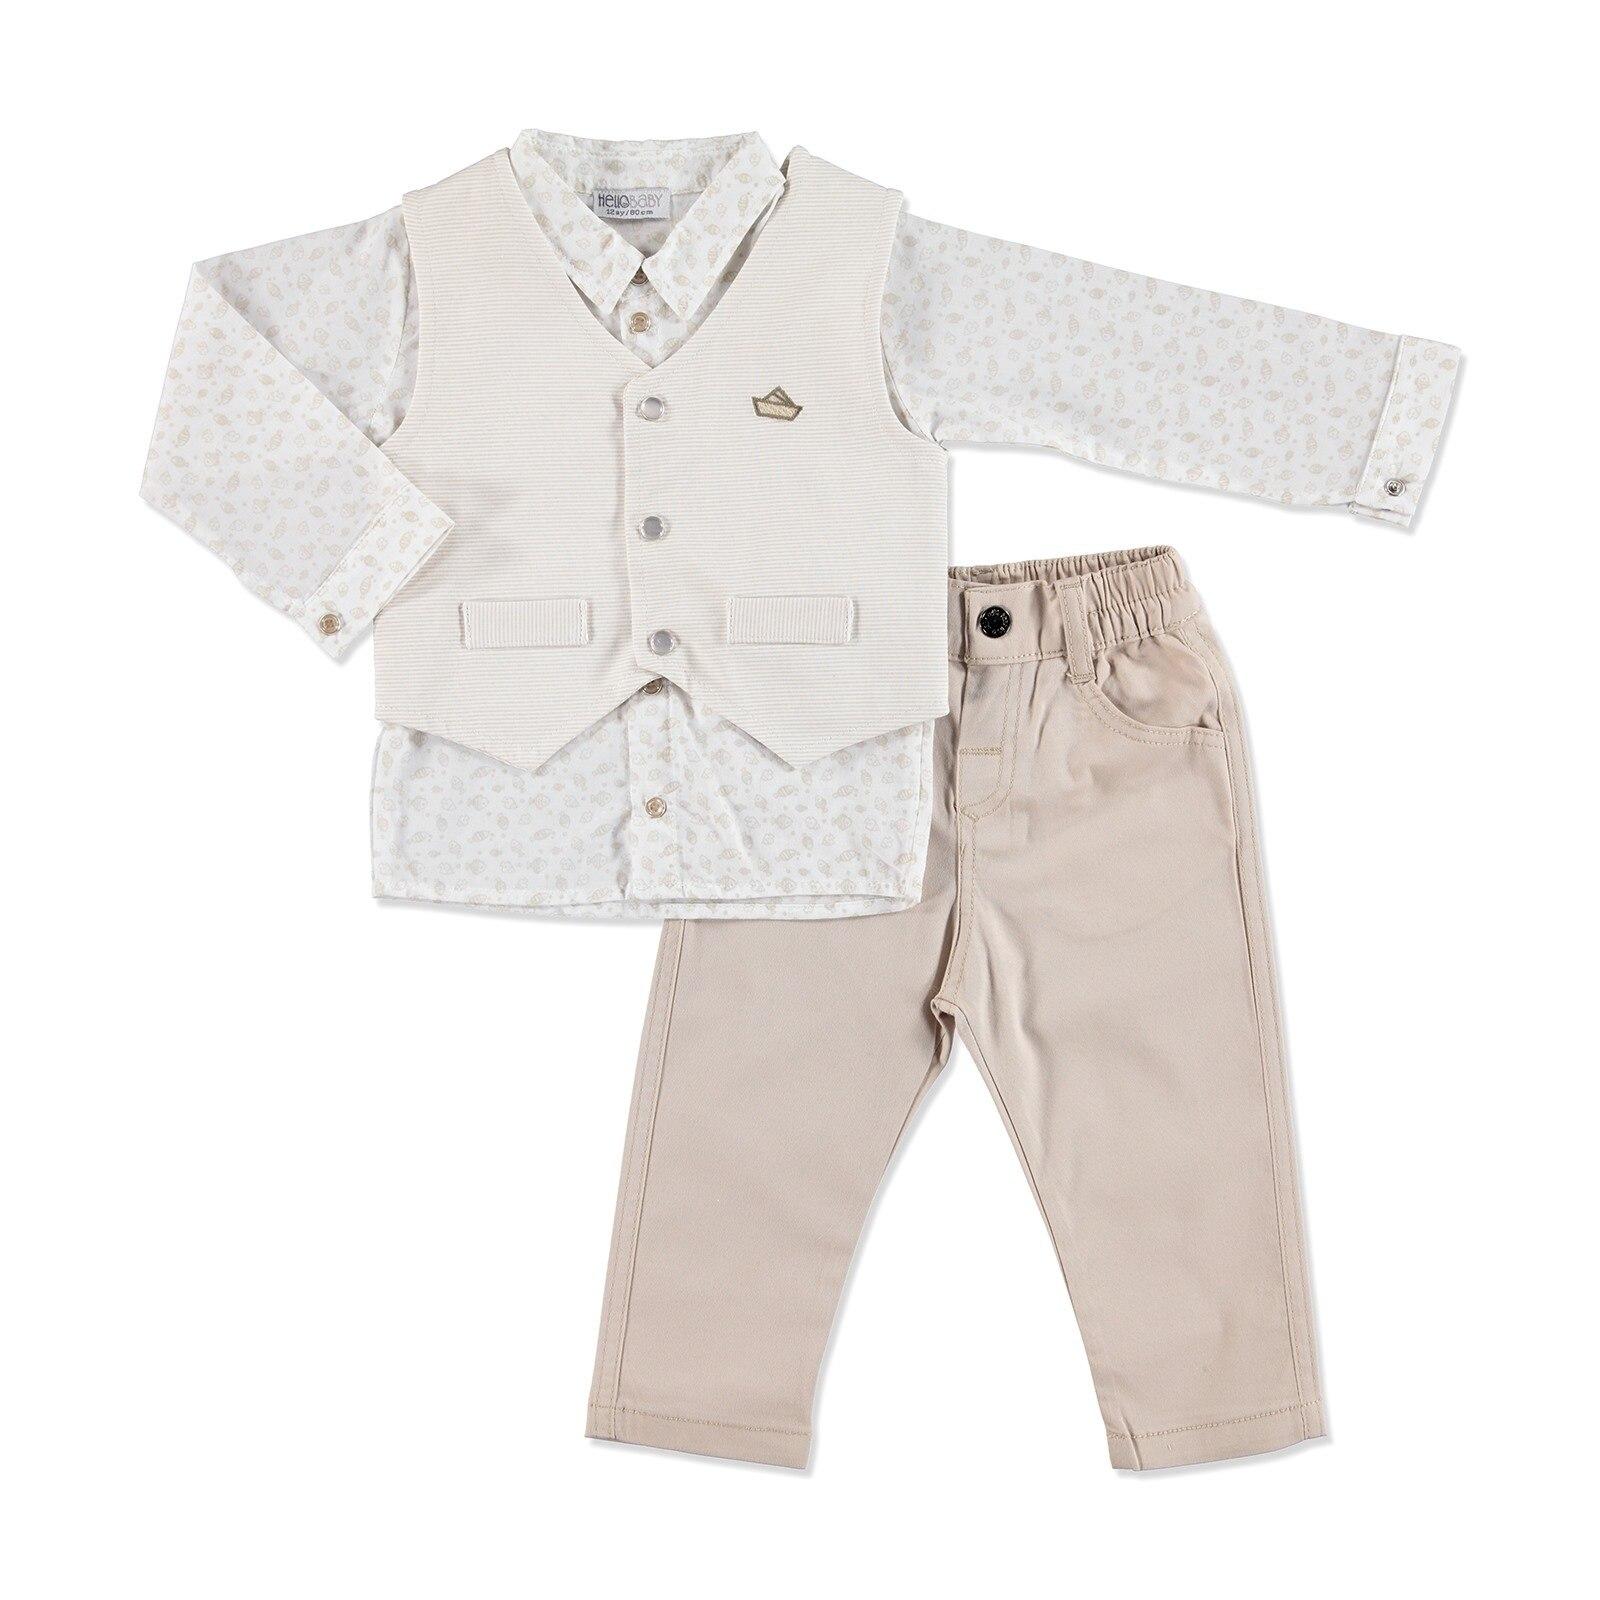 Ebebek HelloBaby Summer Baby The Best Sailor Shirt Pant Vest Set